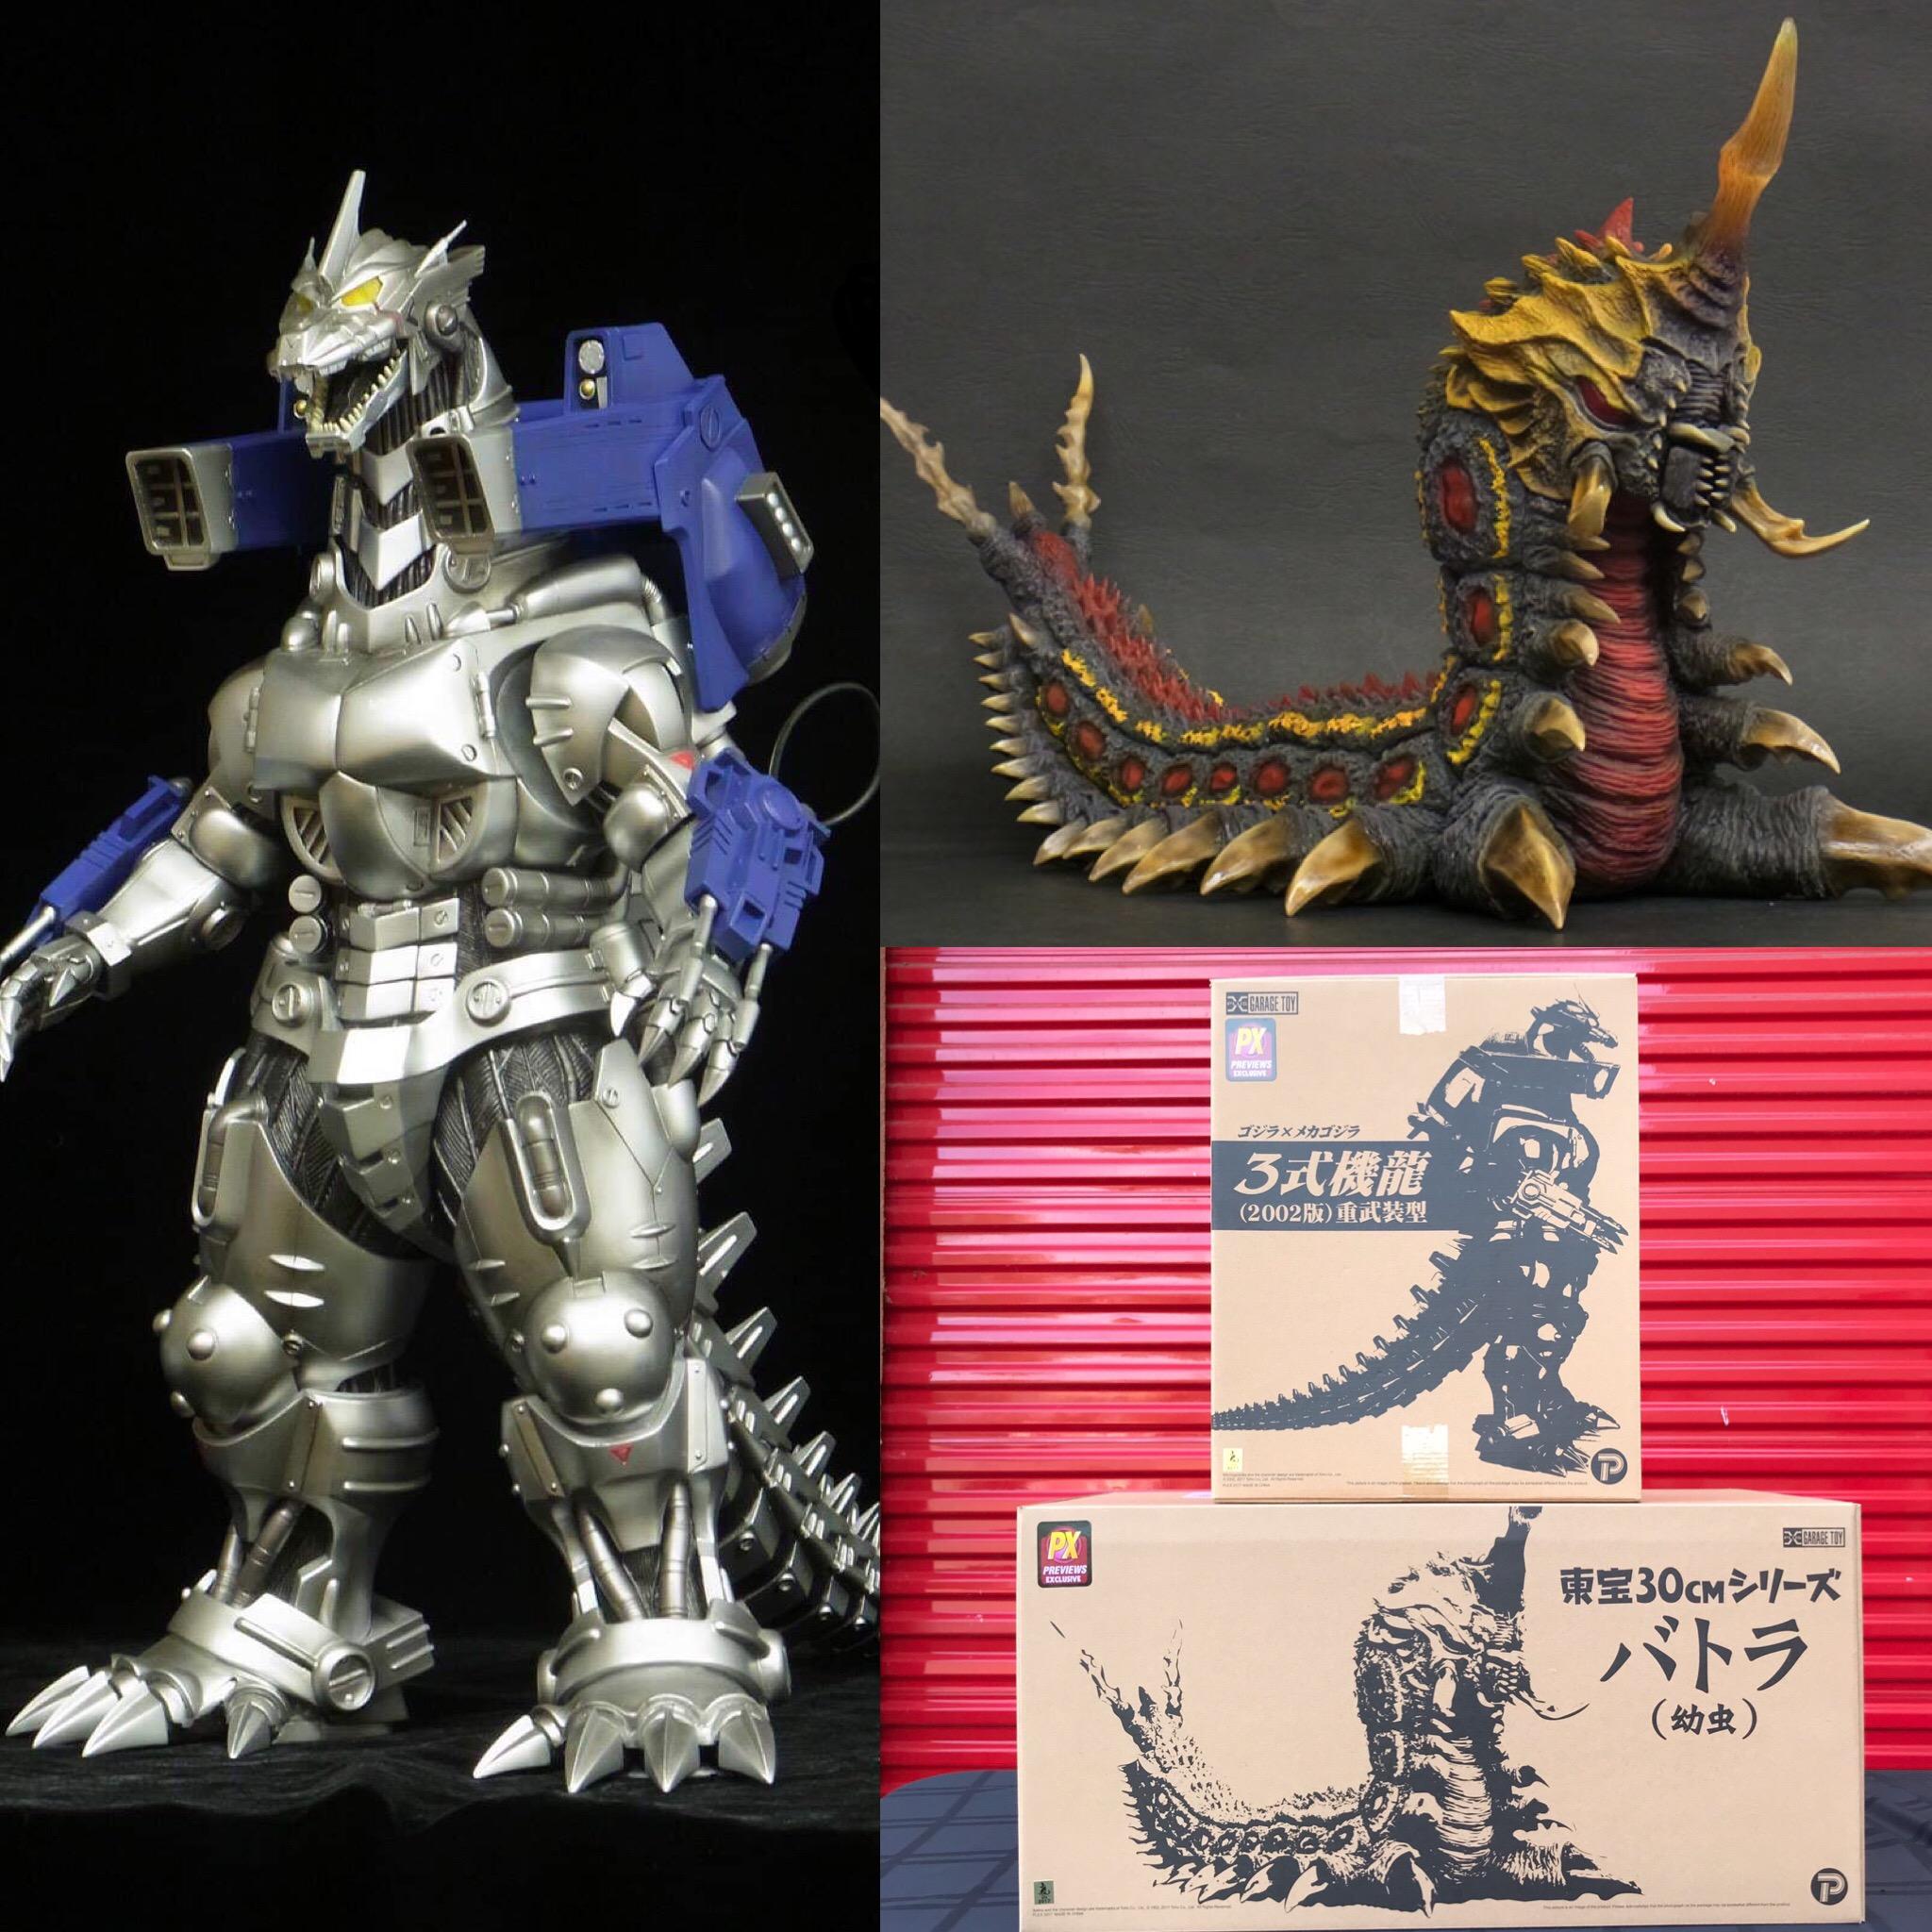 Big Bugs and Badass Robots for G-Fest XXVI!